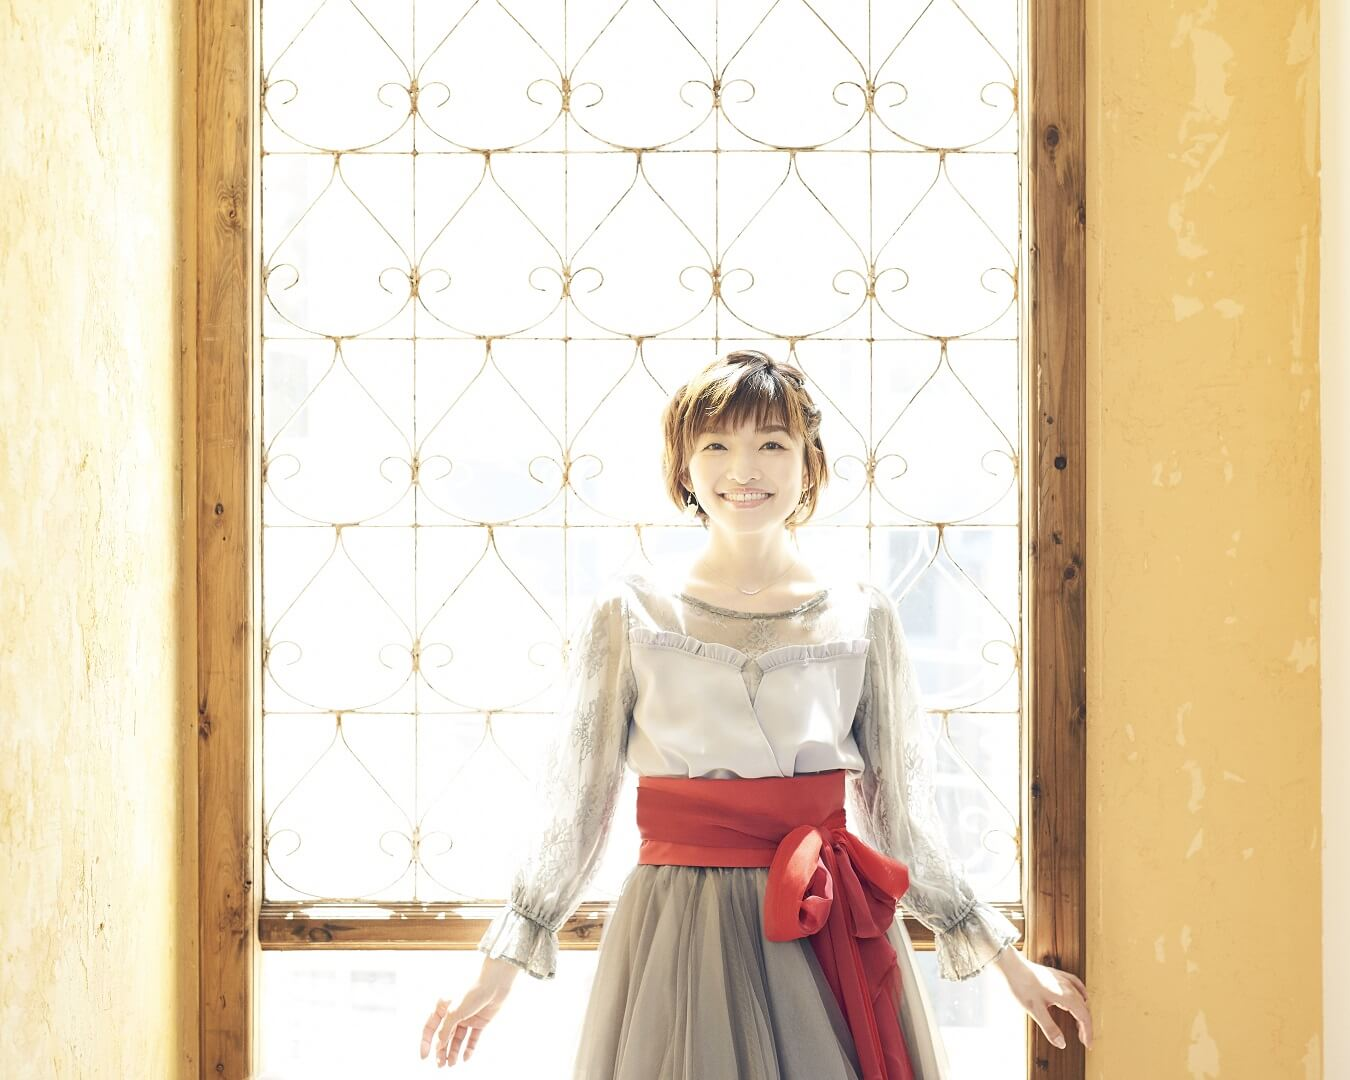 「A&G ARTIST ZONE 吉田仁美の2h」 が一夜限りの復活サムネイル画像